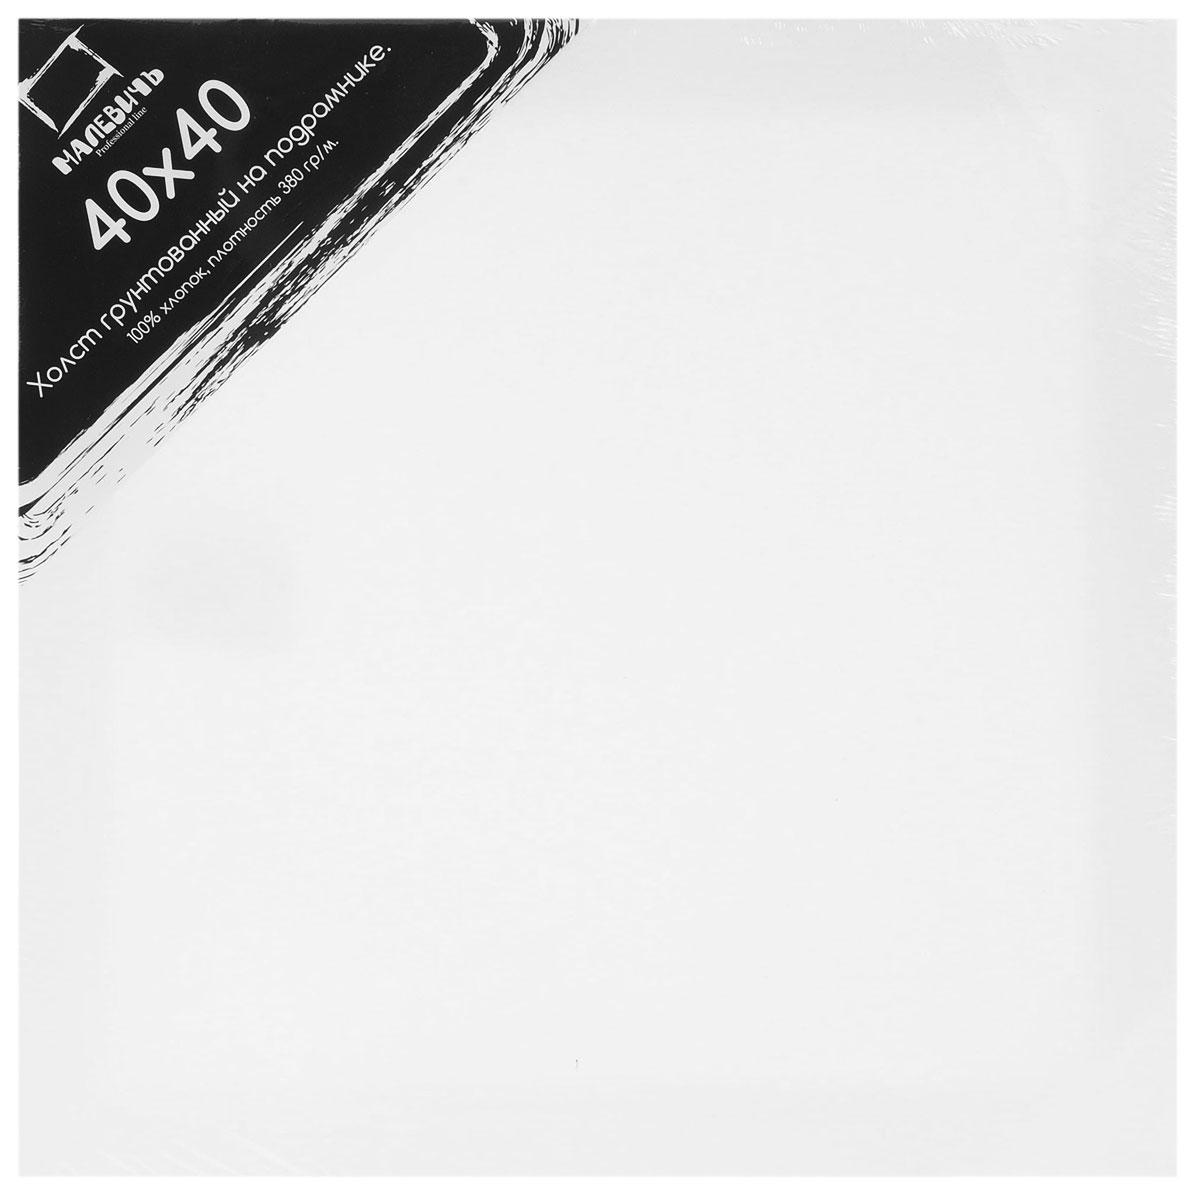 Малевичъ Холст на подрамнике 40 см x 40 см 380 г/м2